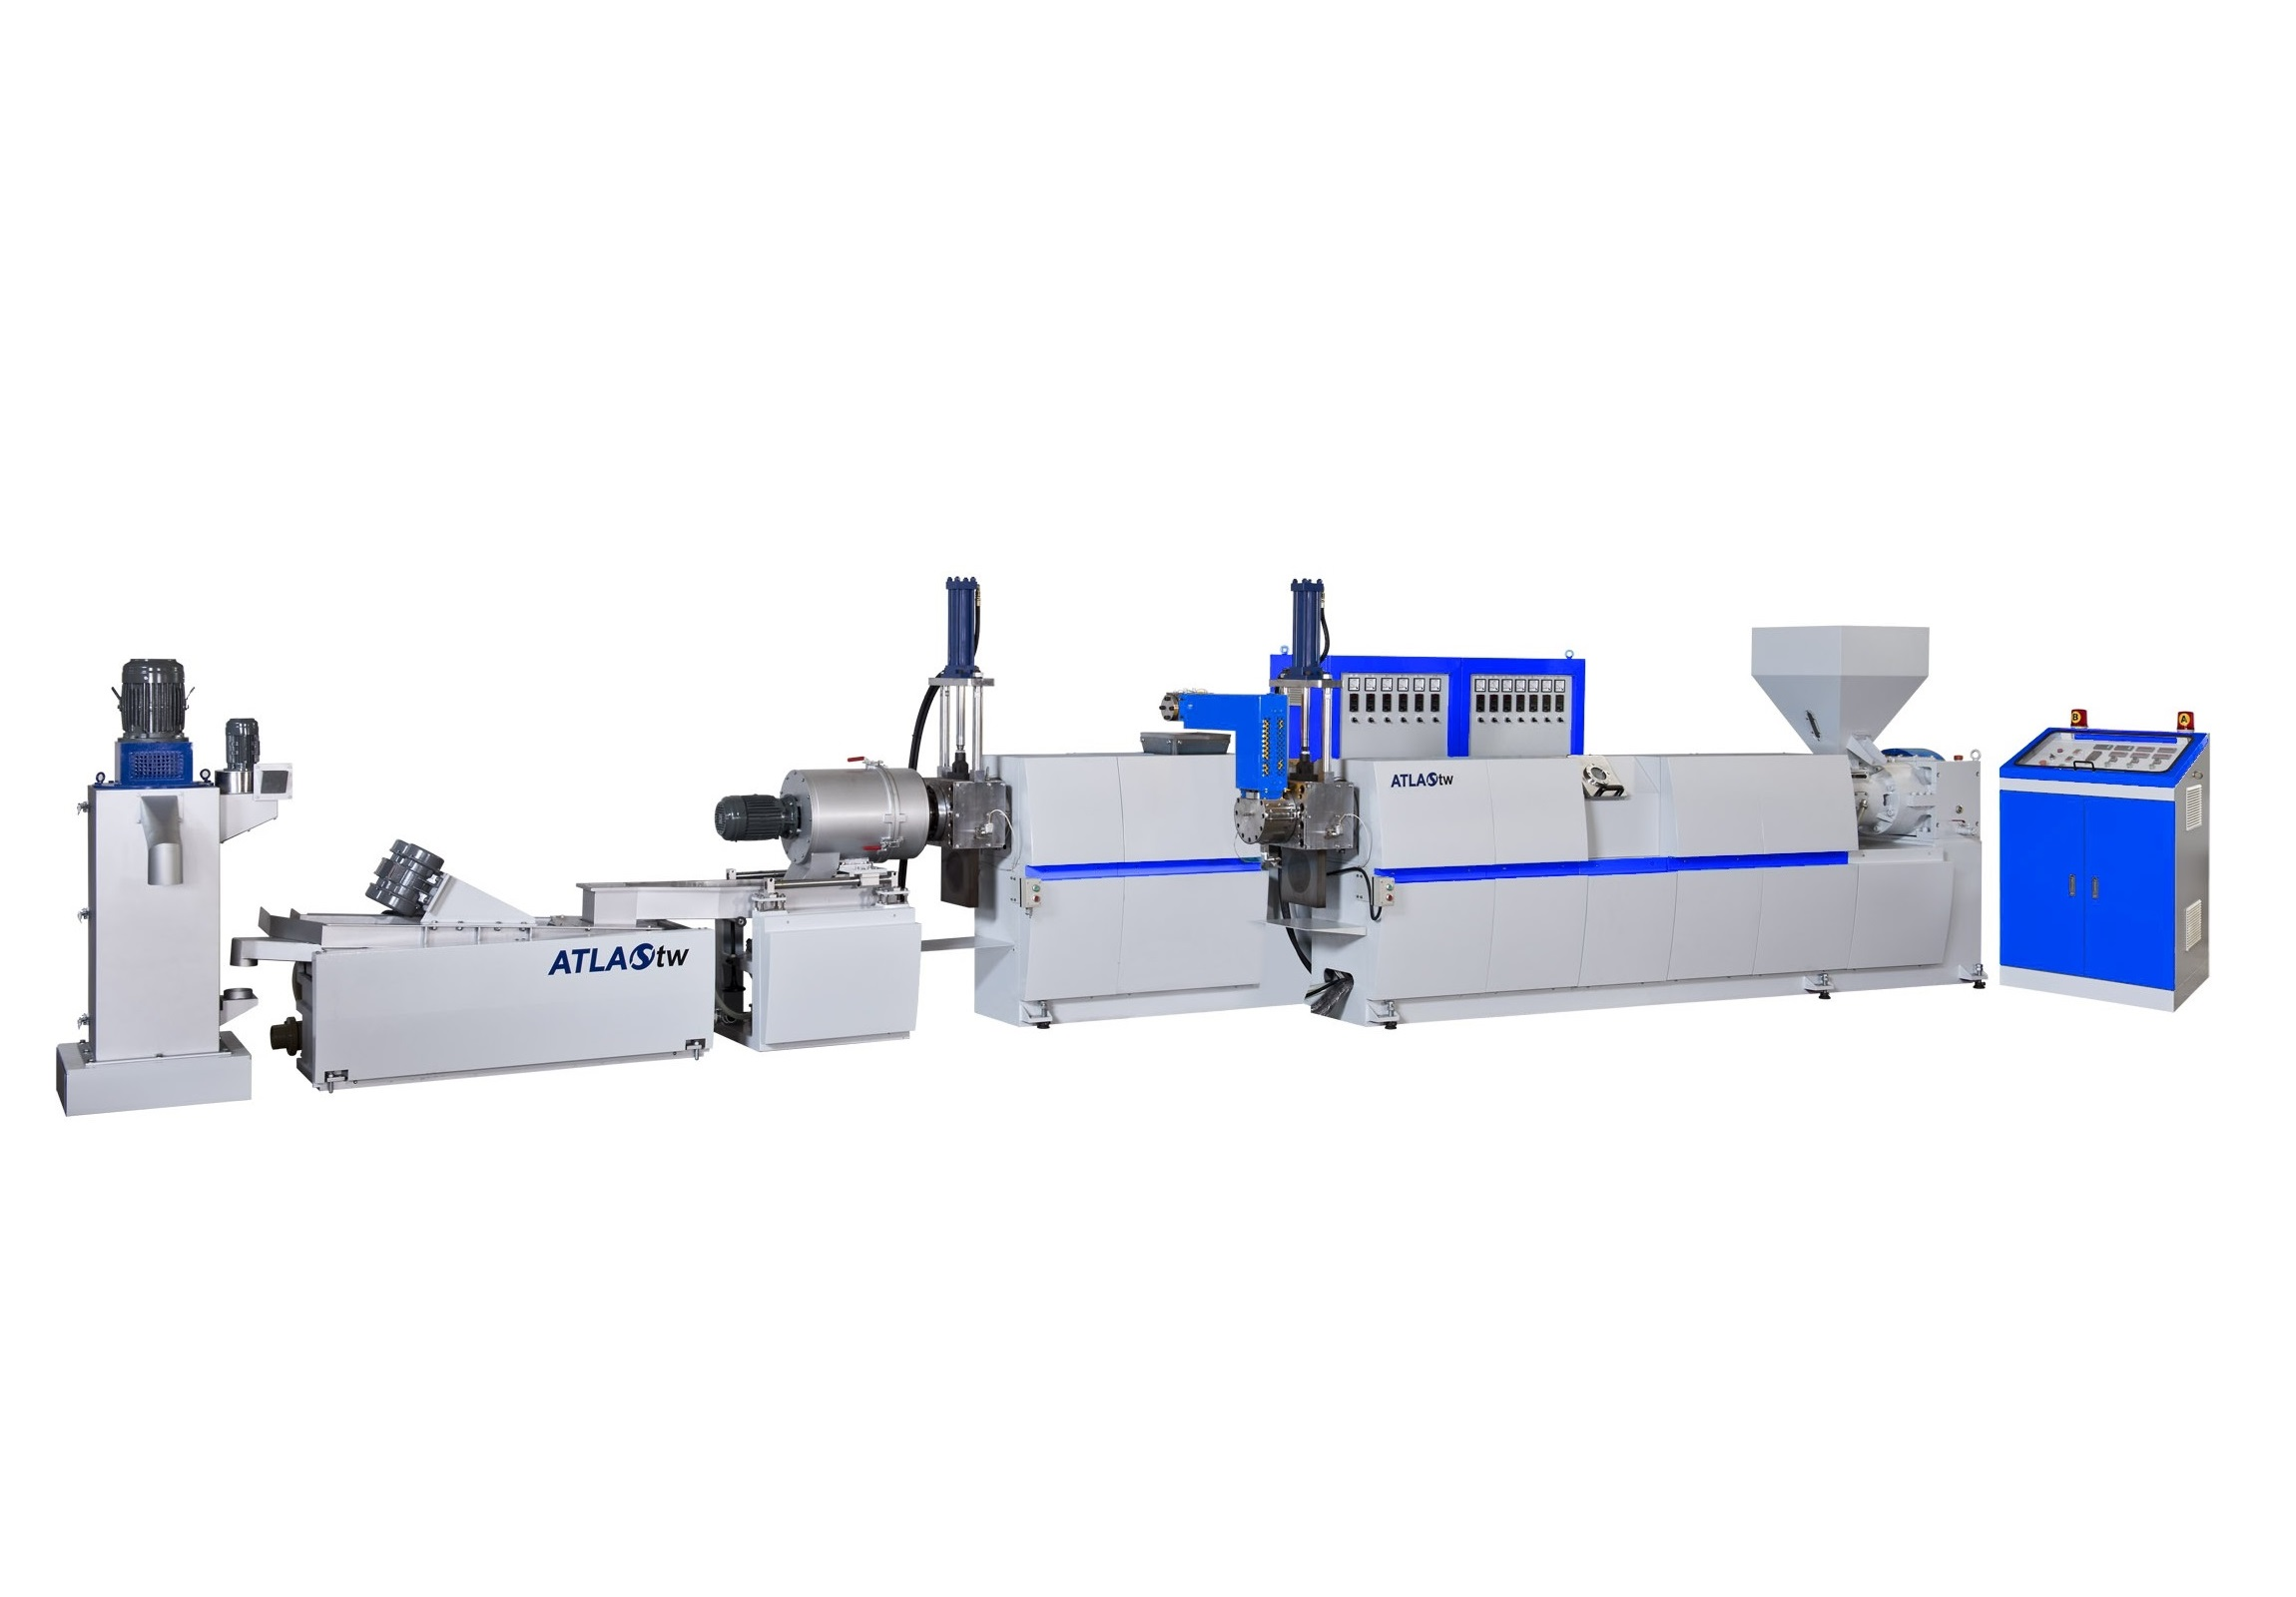 Dua Tahap Hopper Feeding & Die Face Cutting Plastic Recycling & Pelletizing Machine dirancang dan dibuat terutama untuk mendaur ulang plastik dan bahan injeksi yang dihancurkan. Dilengkapi dengan dua ekstruder, model dua tahap lebih mampu menyaring kotoran dan tinta cetak berat dari bahan.